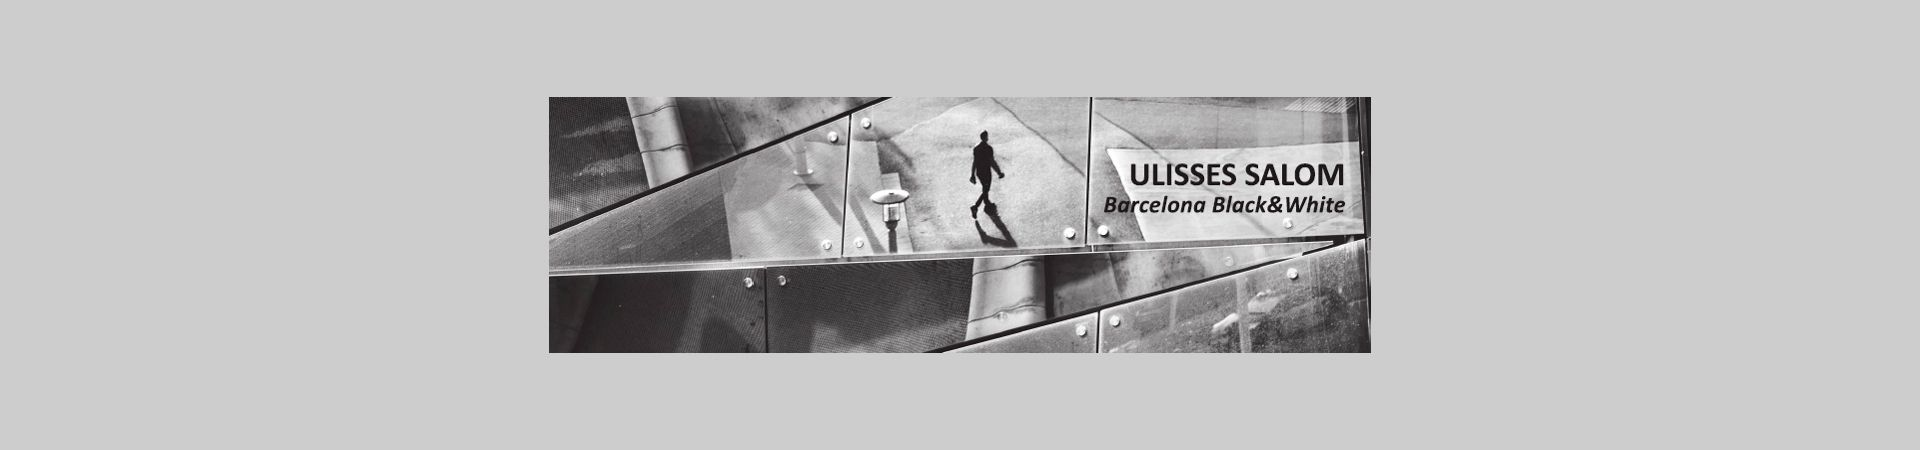 Ulisses Salom. Barcelona Black and White